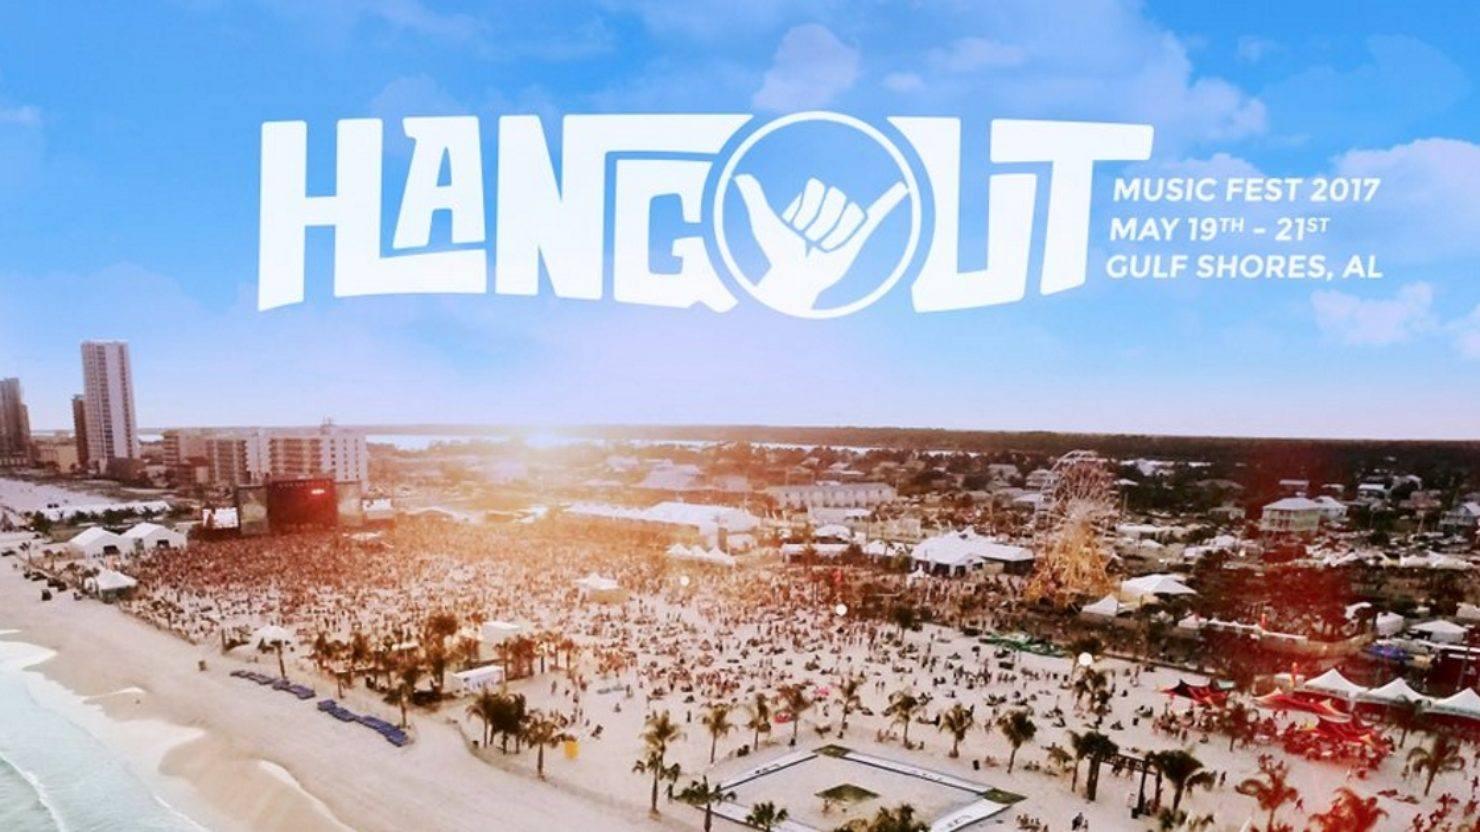 Hangout-2017-Crop-1480x832.jpg